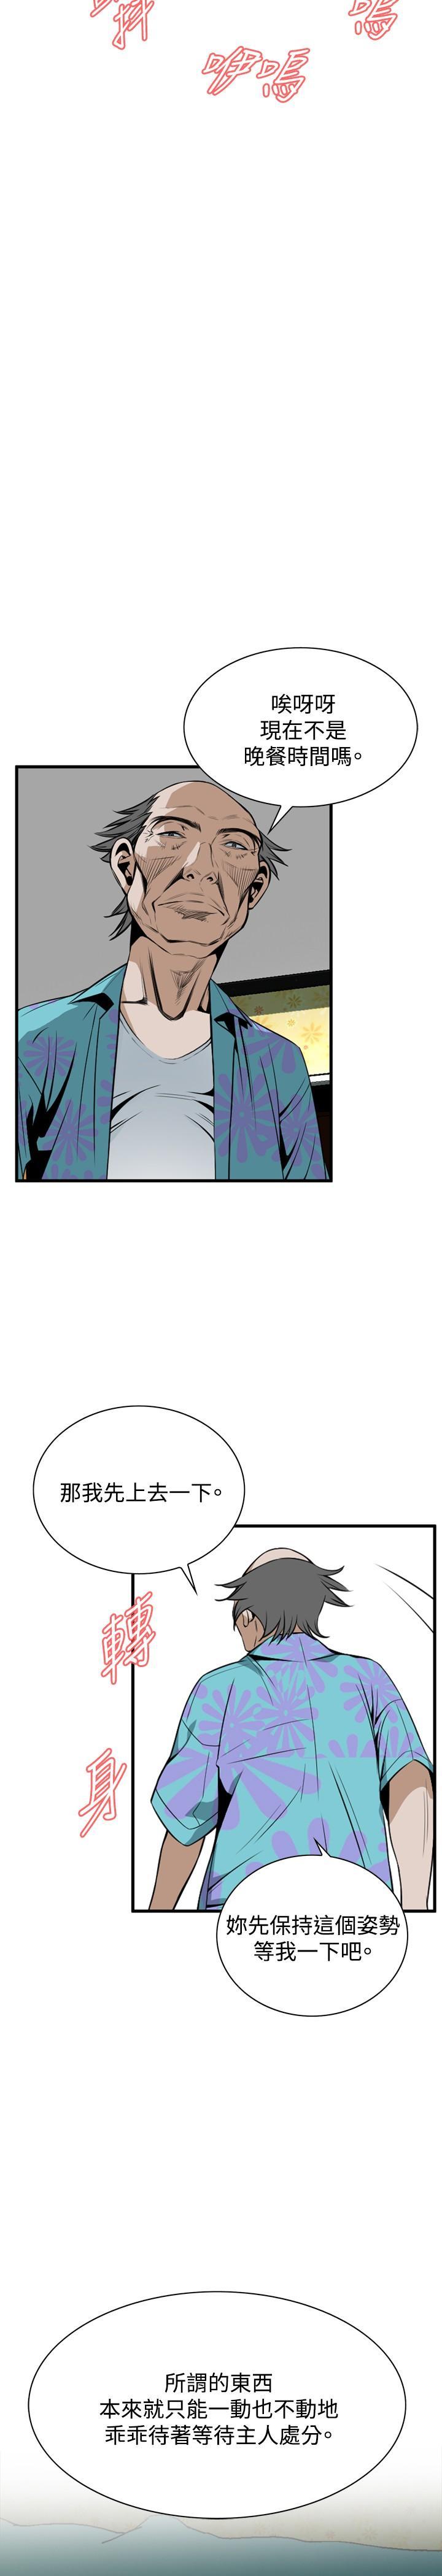 Take a Peek 偷窥 Ch.39~51 [Chinese]中文 135